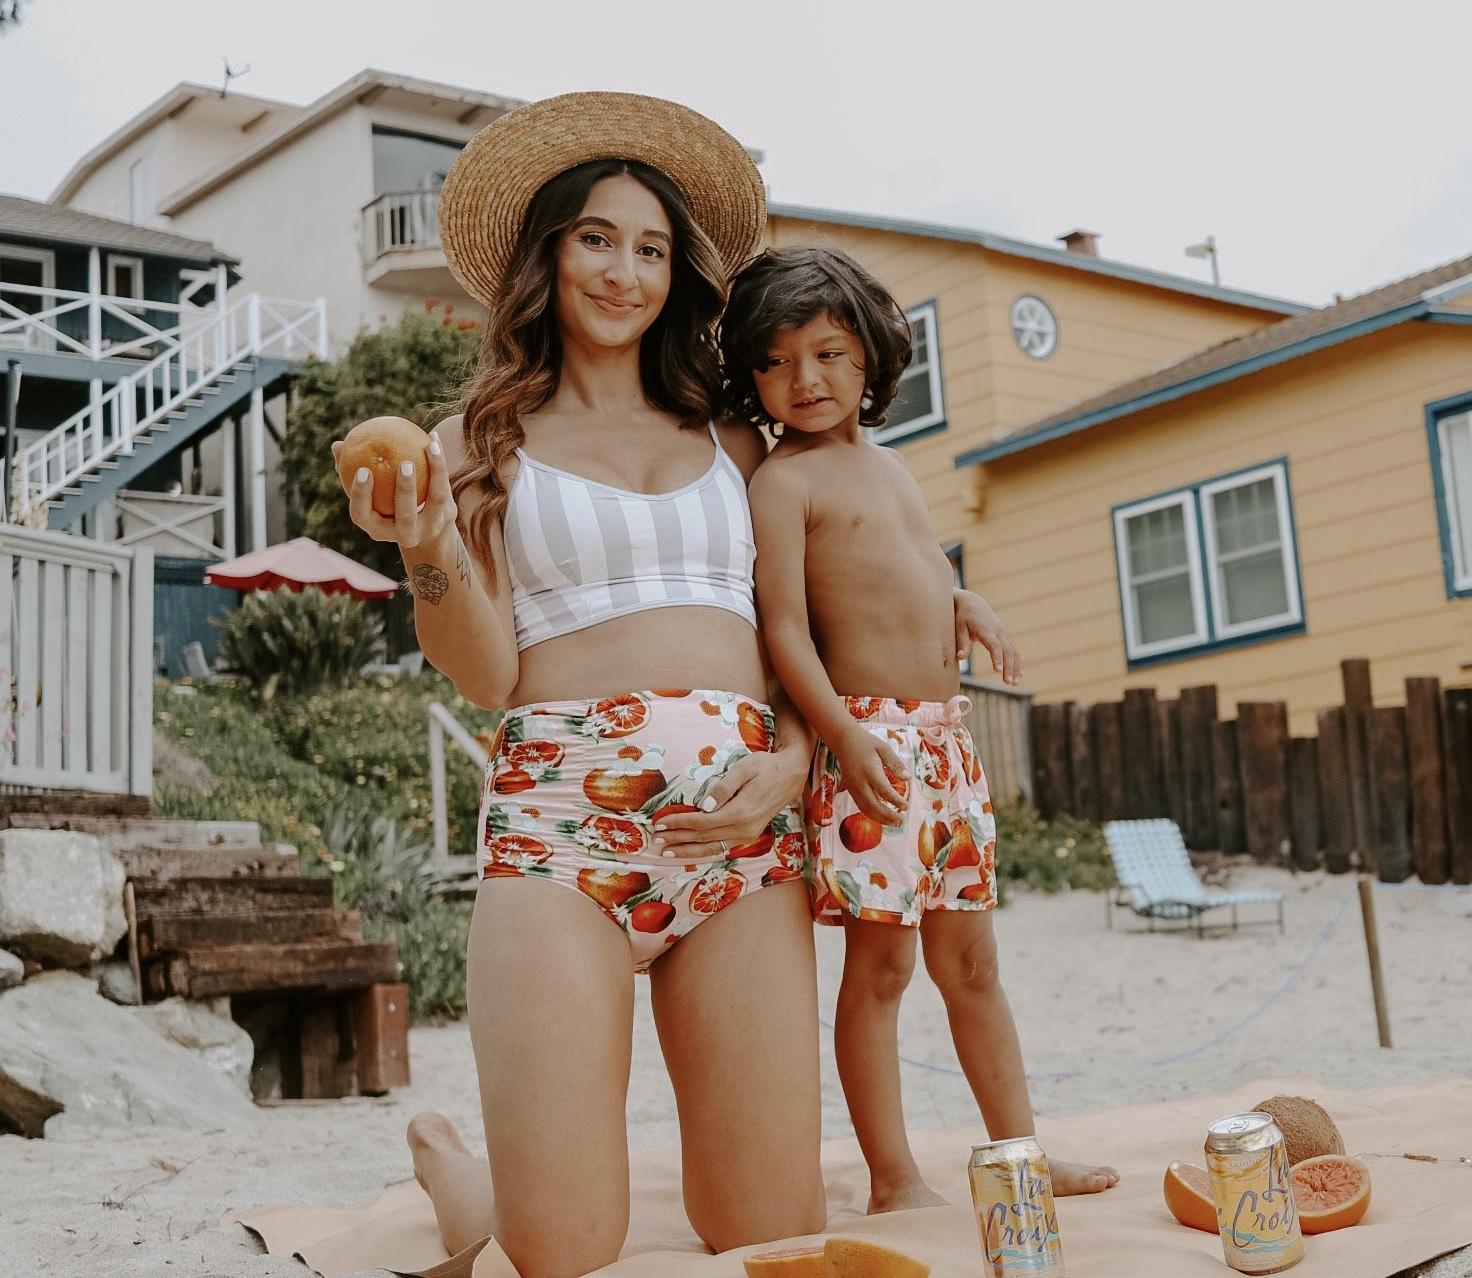 Kortni Jeane swimsuit, Kortni Jeane Maternity, maternity swimwear, grapefruit swimsuit, 24 weeks pregnant, mommy and me swimwear, kortni jeane boys